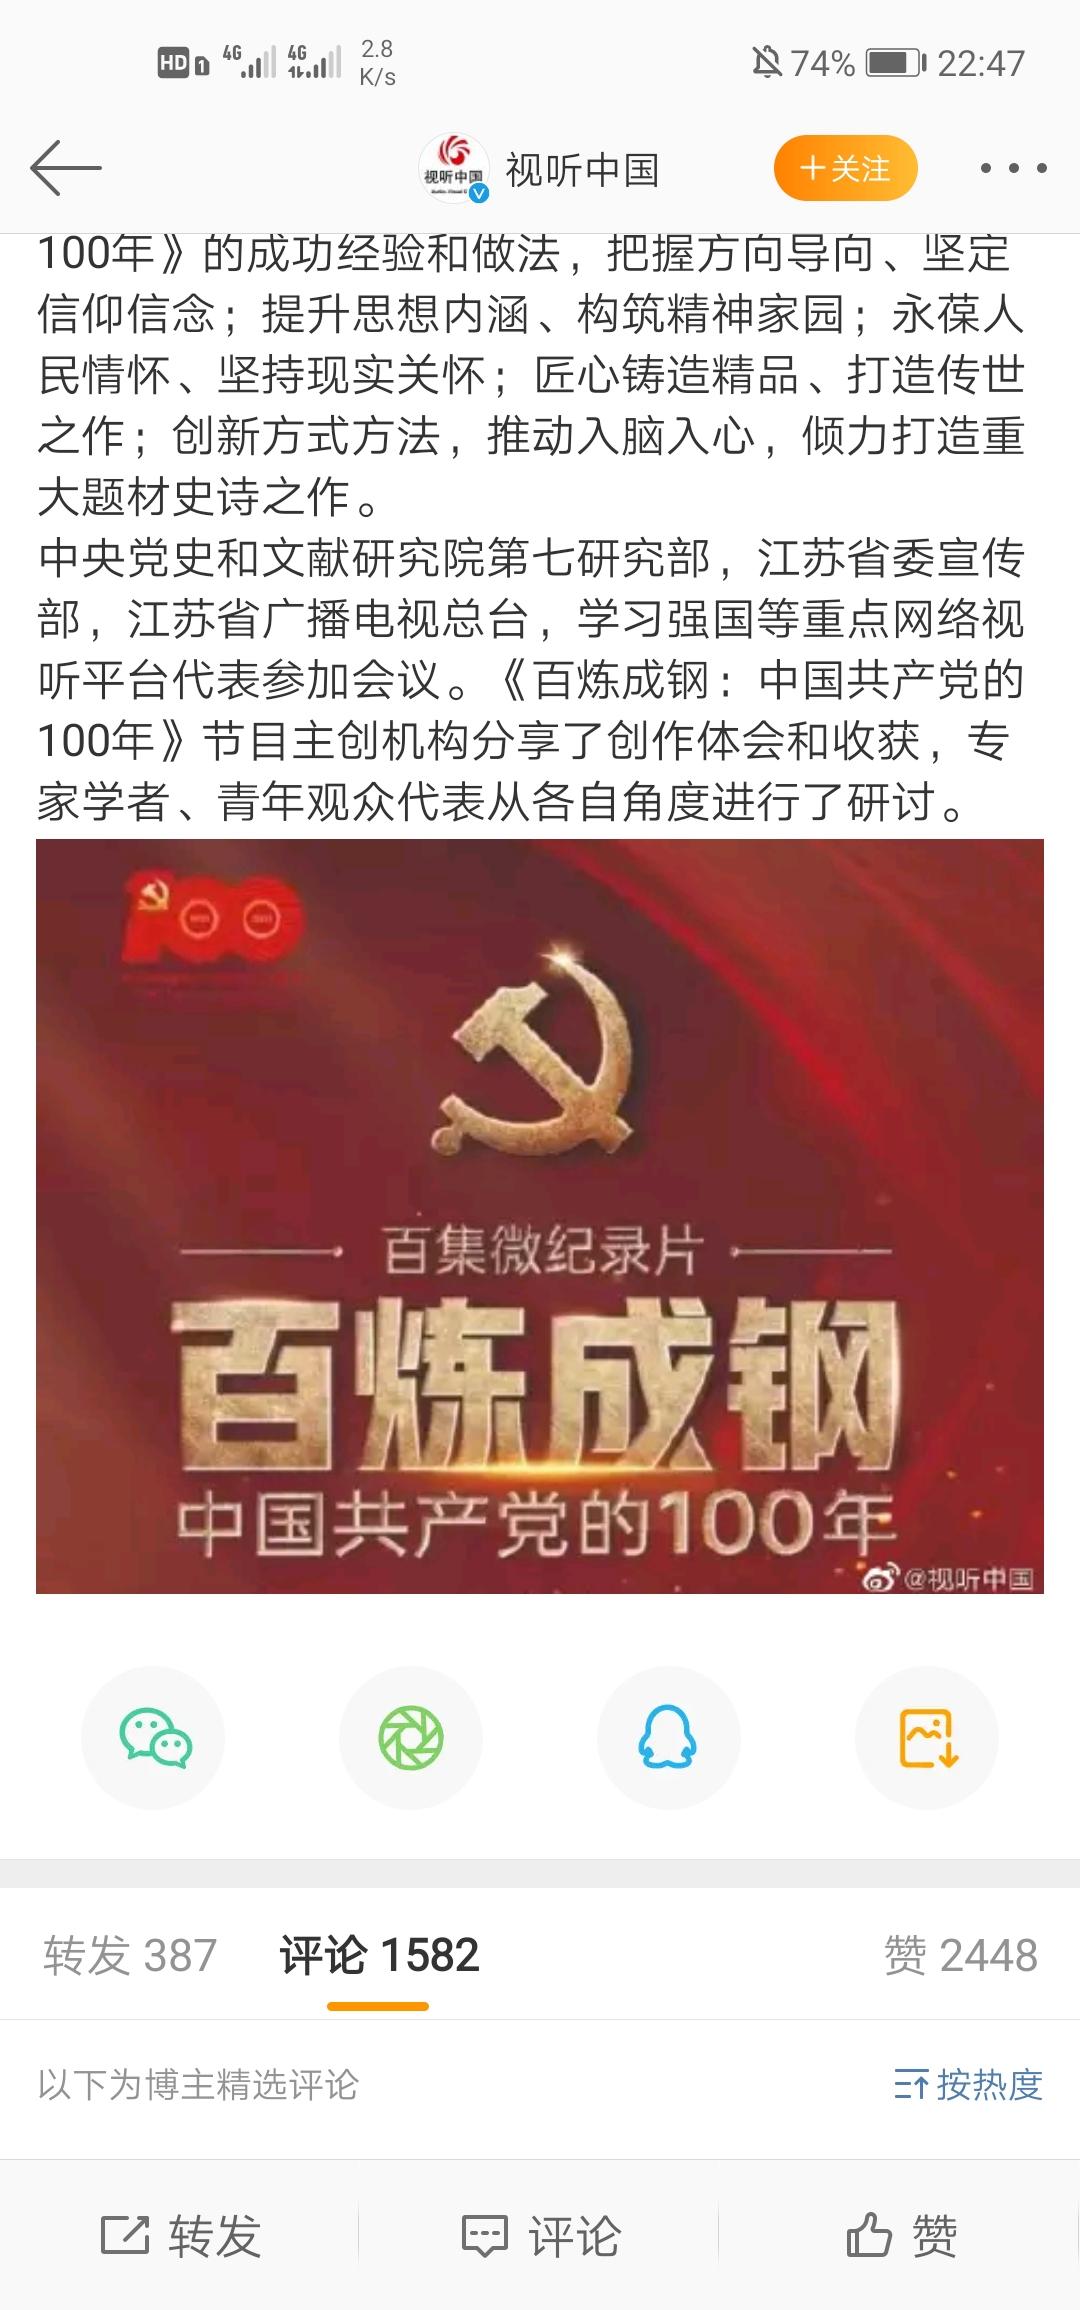 Screenshot_20210916_224736_com_sina_weibo.jpg